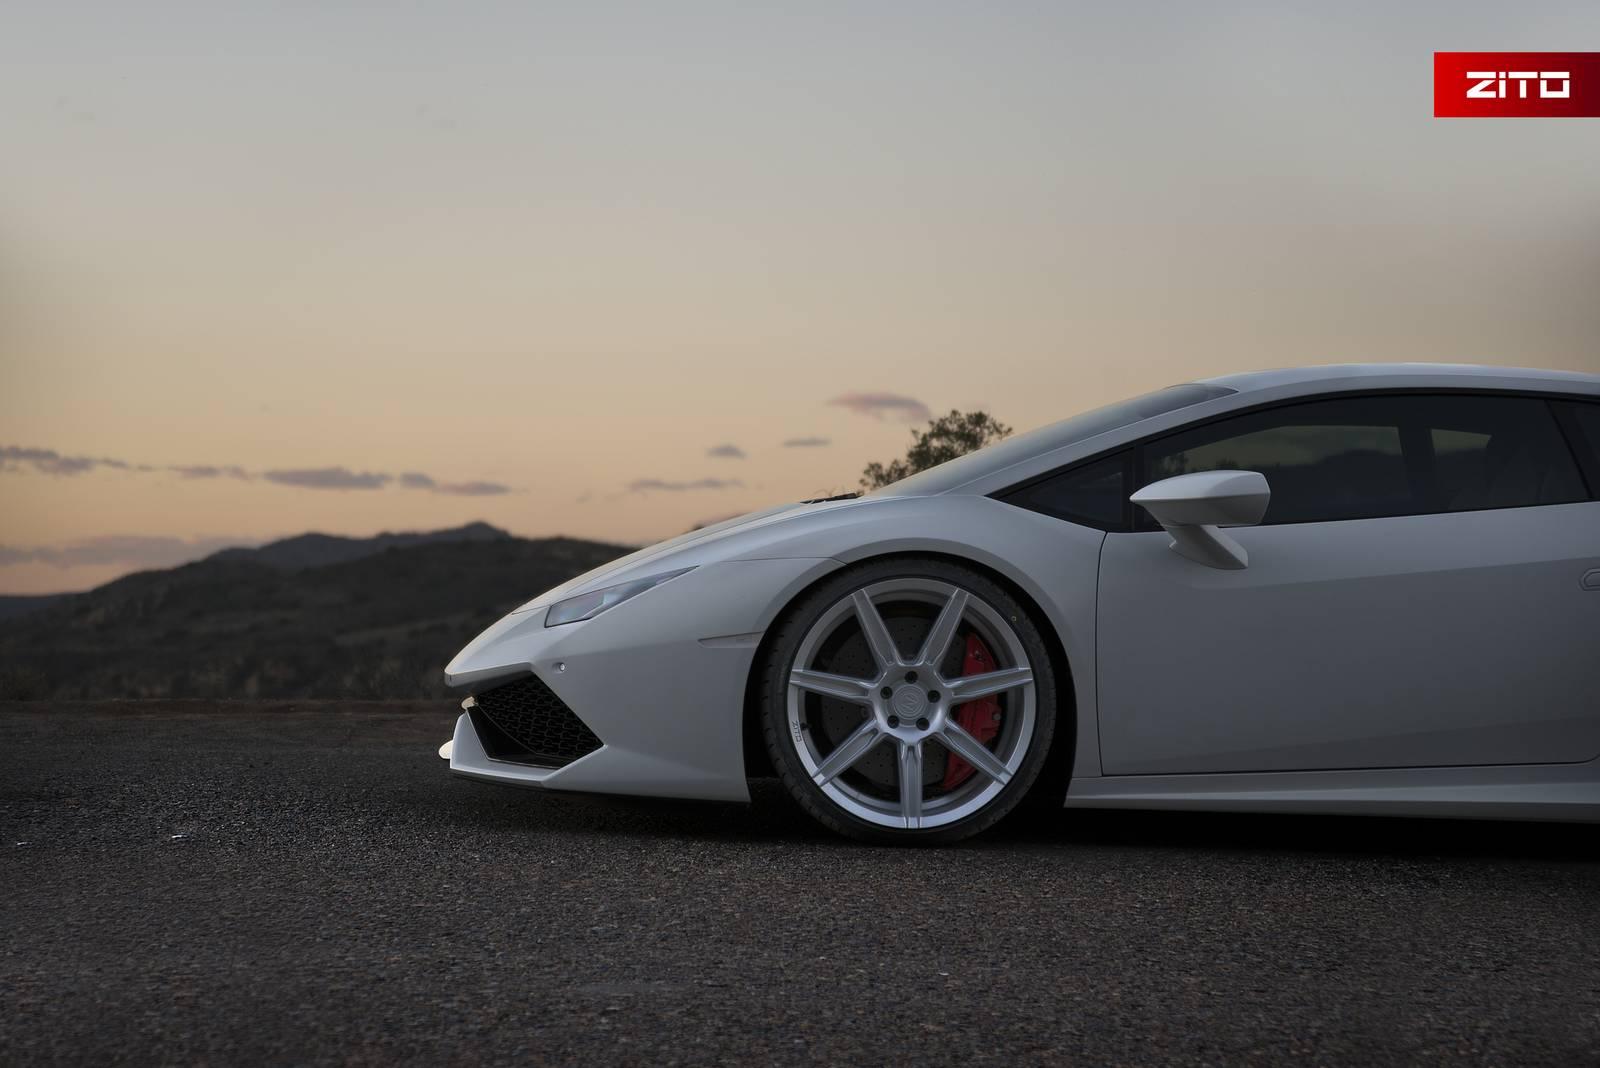 Silver Lamborghini Urus >> Bianco Novus Lamborghini Huracan with Anodized Silver Zito Wheels - GTspirit